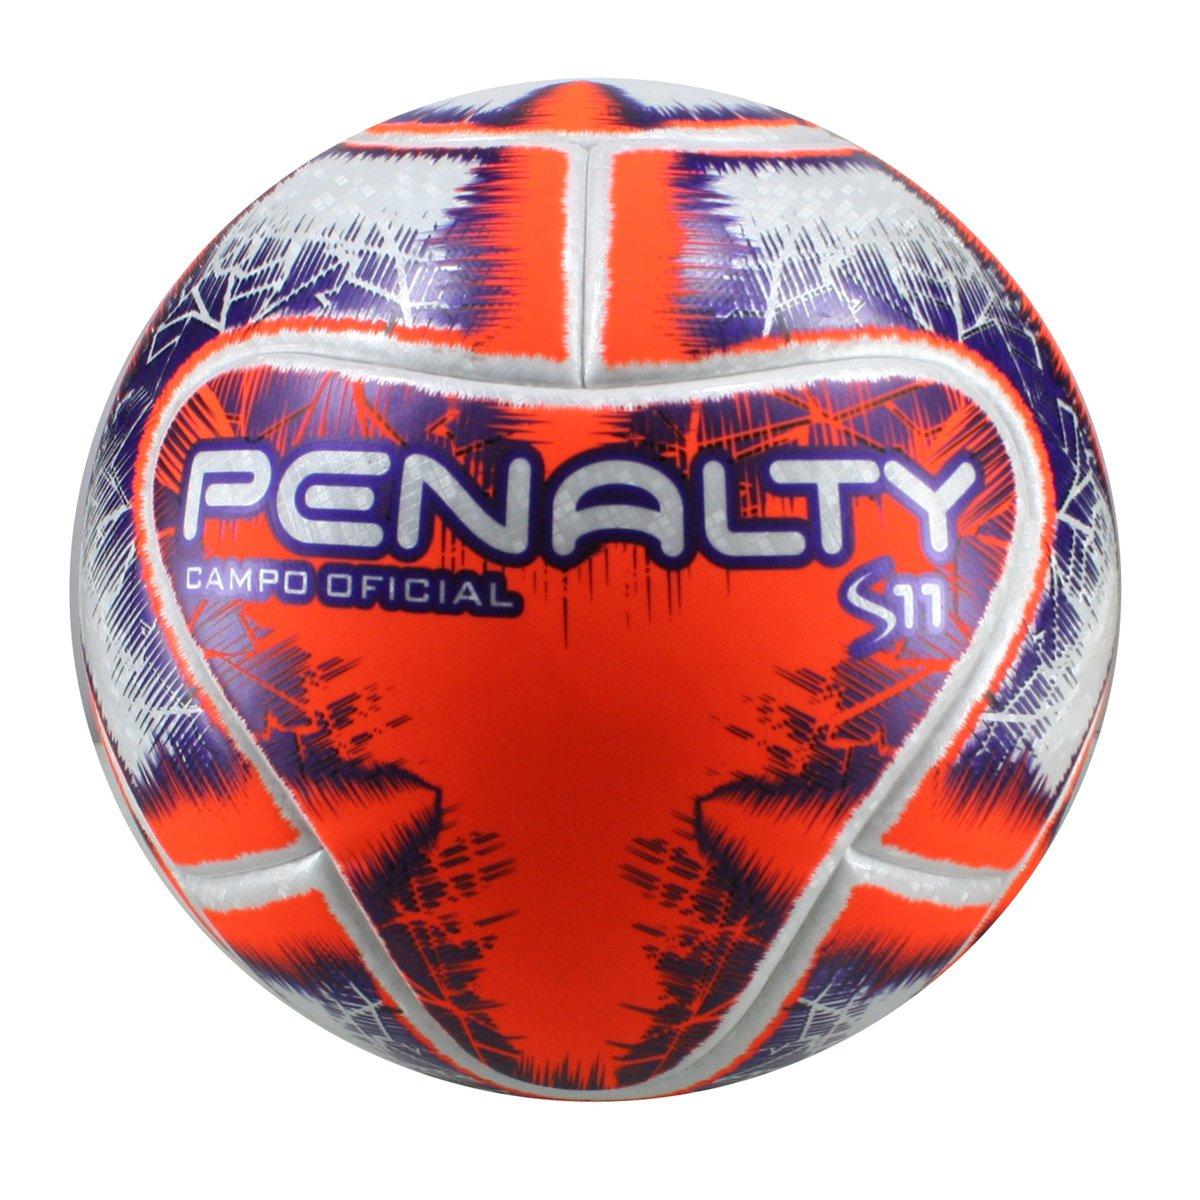 Bola Penalty Campo Oficial S11 R1 IX Gauchão 2019 541542-1712  Branco Laranja  a04bffc19d6cd